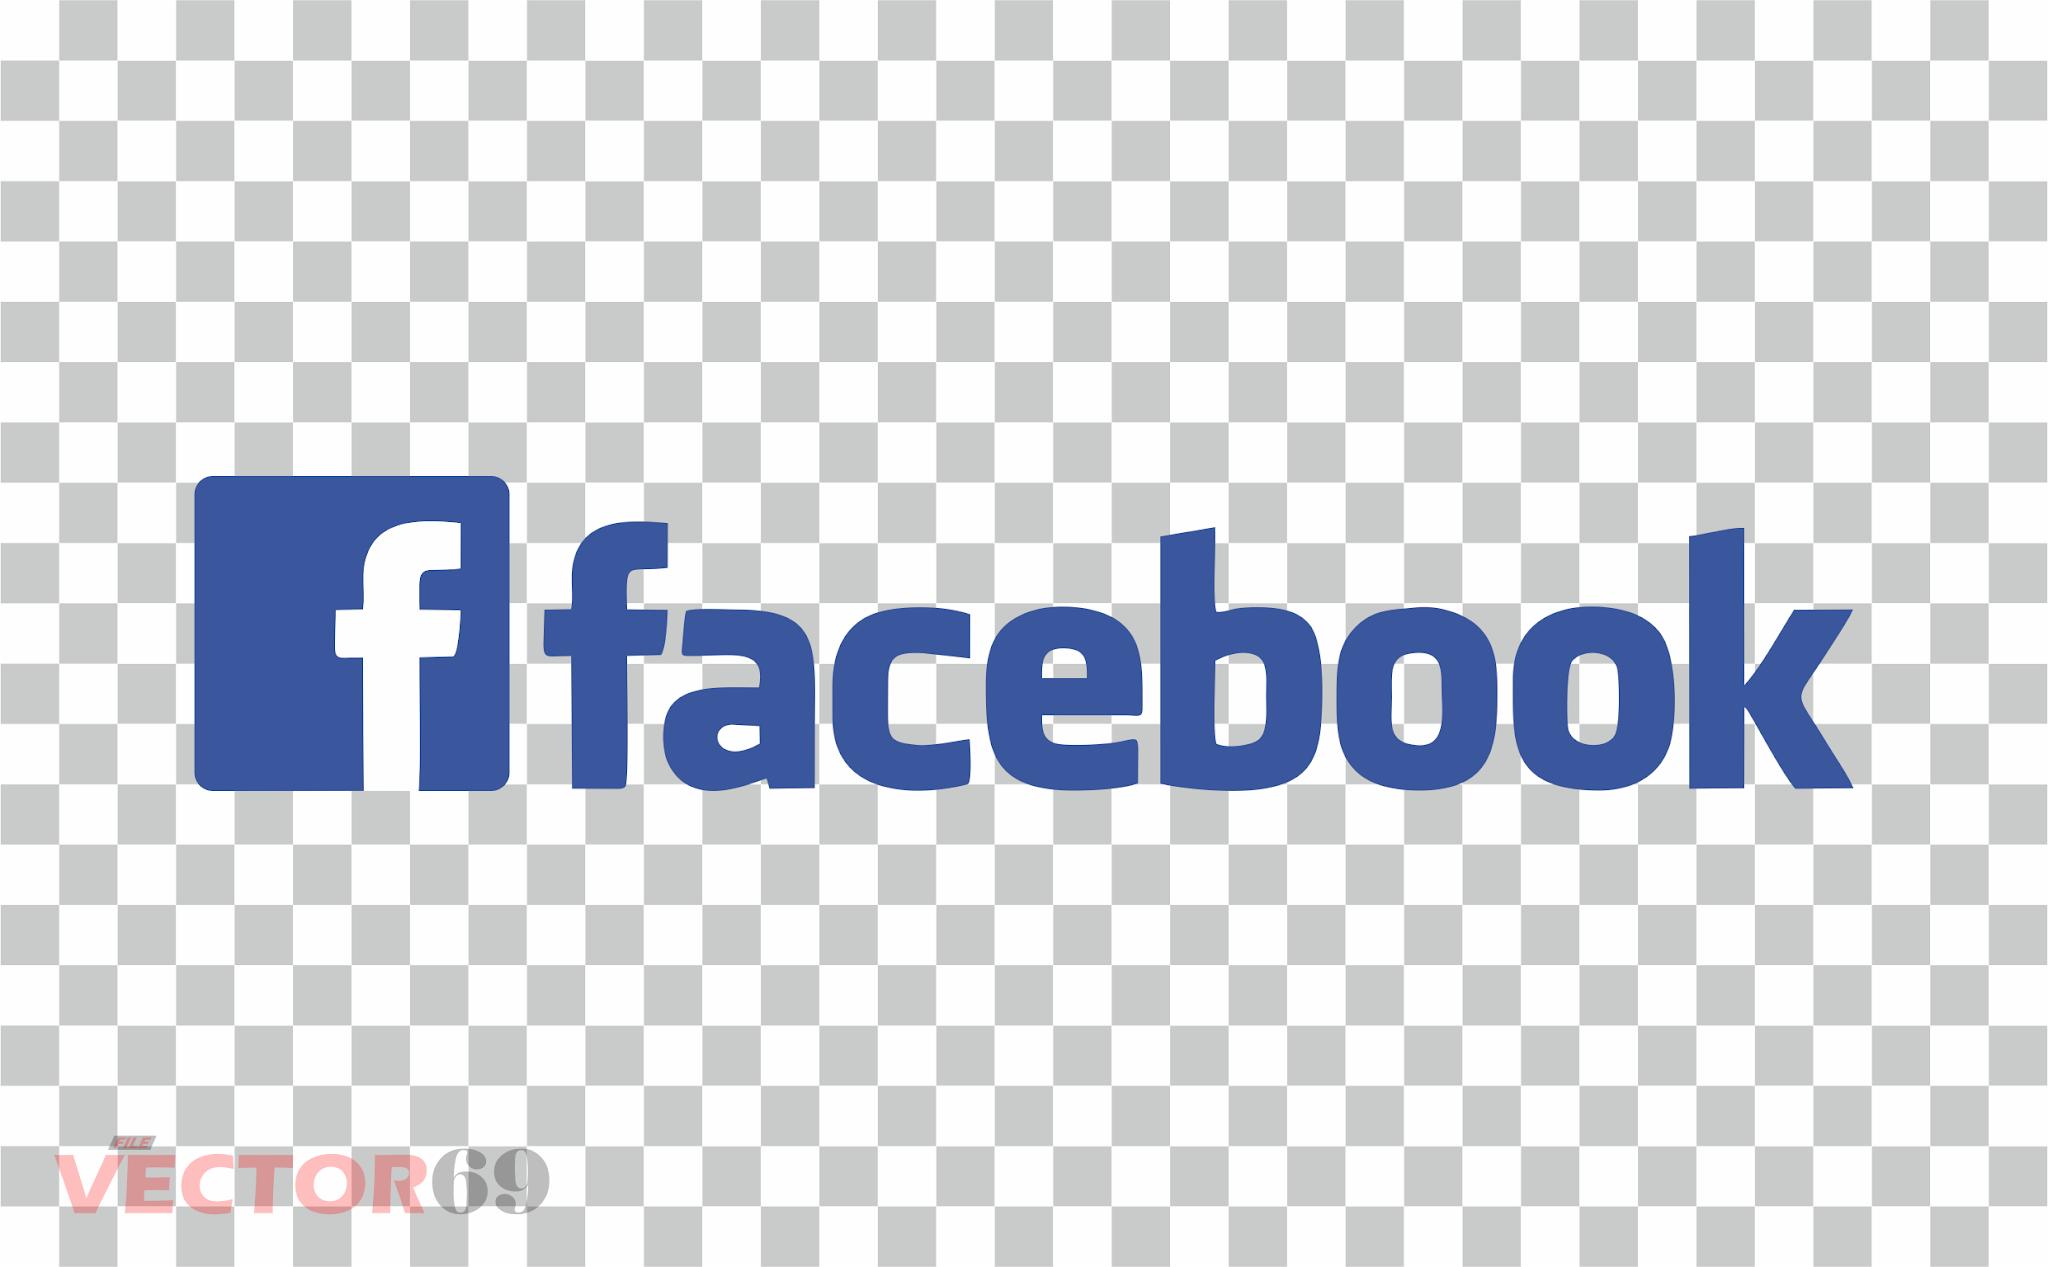 Facebook Logo - Download Vector File PNG (Portable Network Graphics)